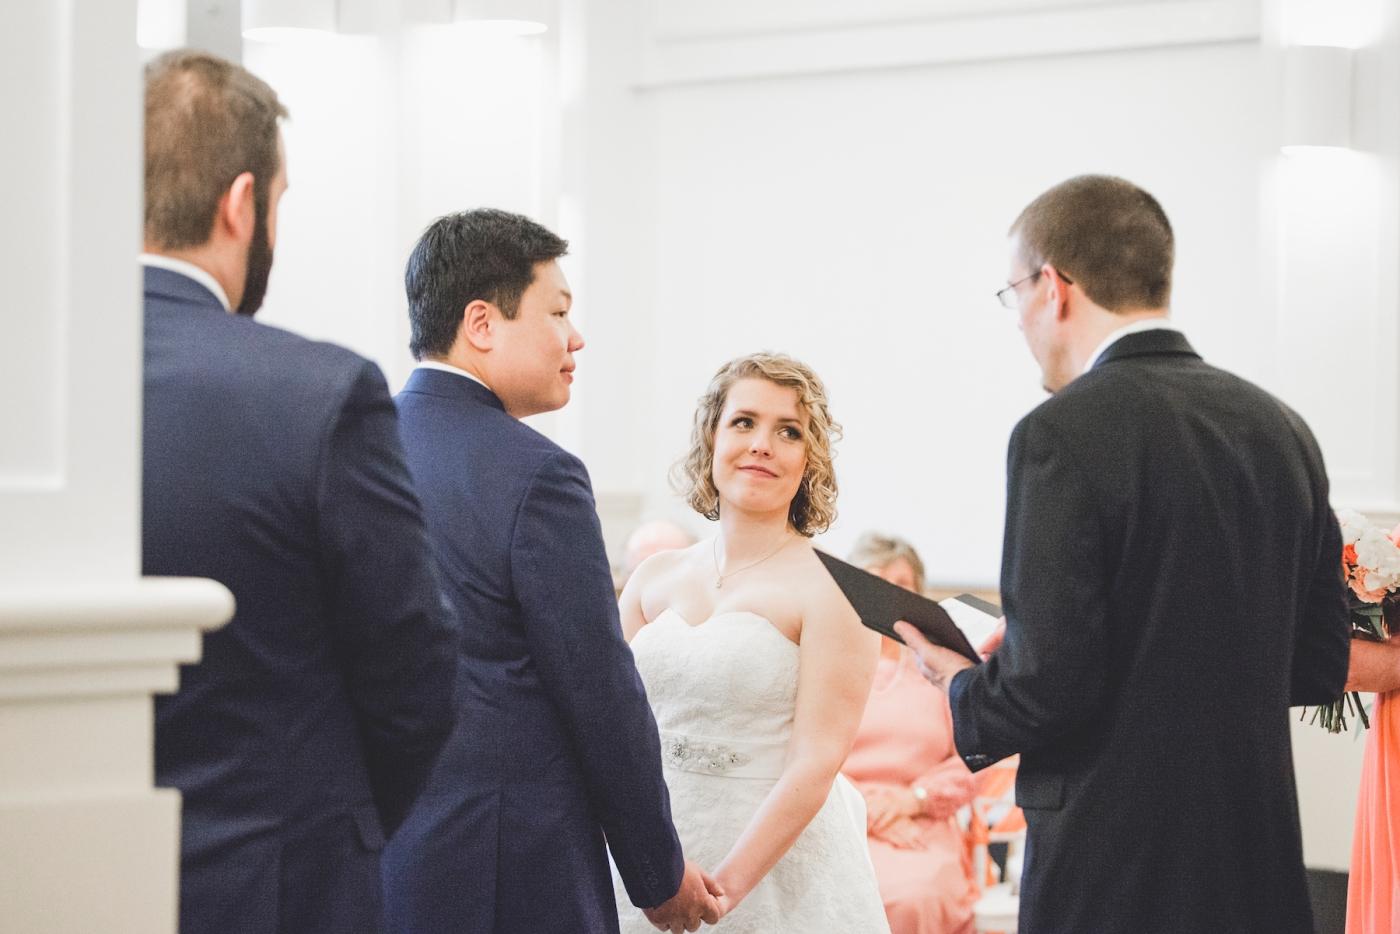 DSC_2656Everett_Wedding_Ballroom_Jane_Speleers_photography_Rachel_and_Edmund_Ceremony_2017